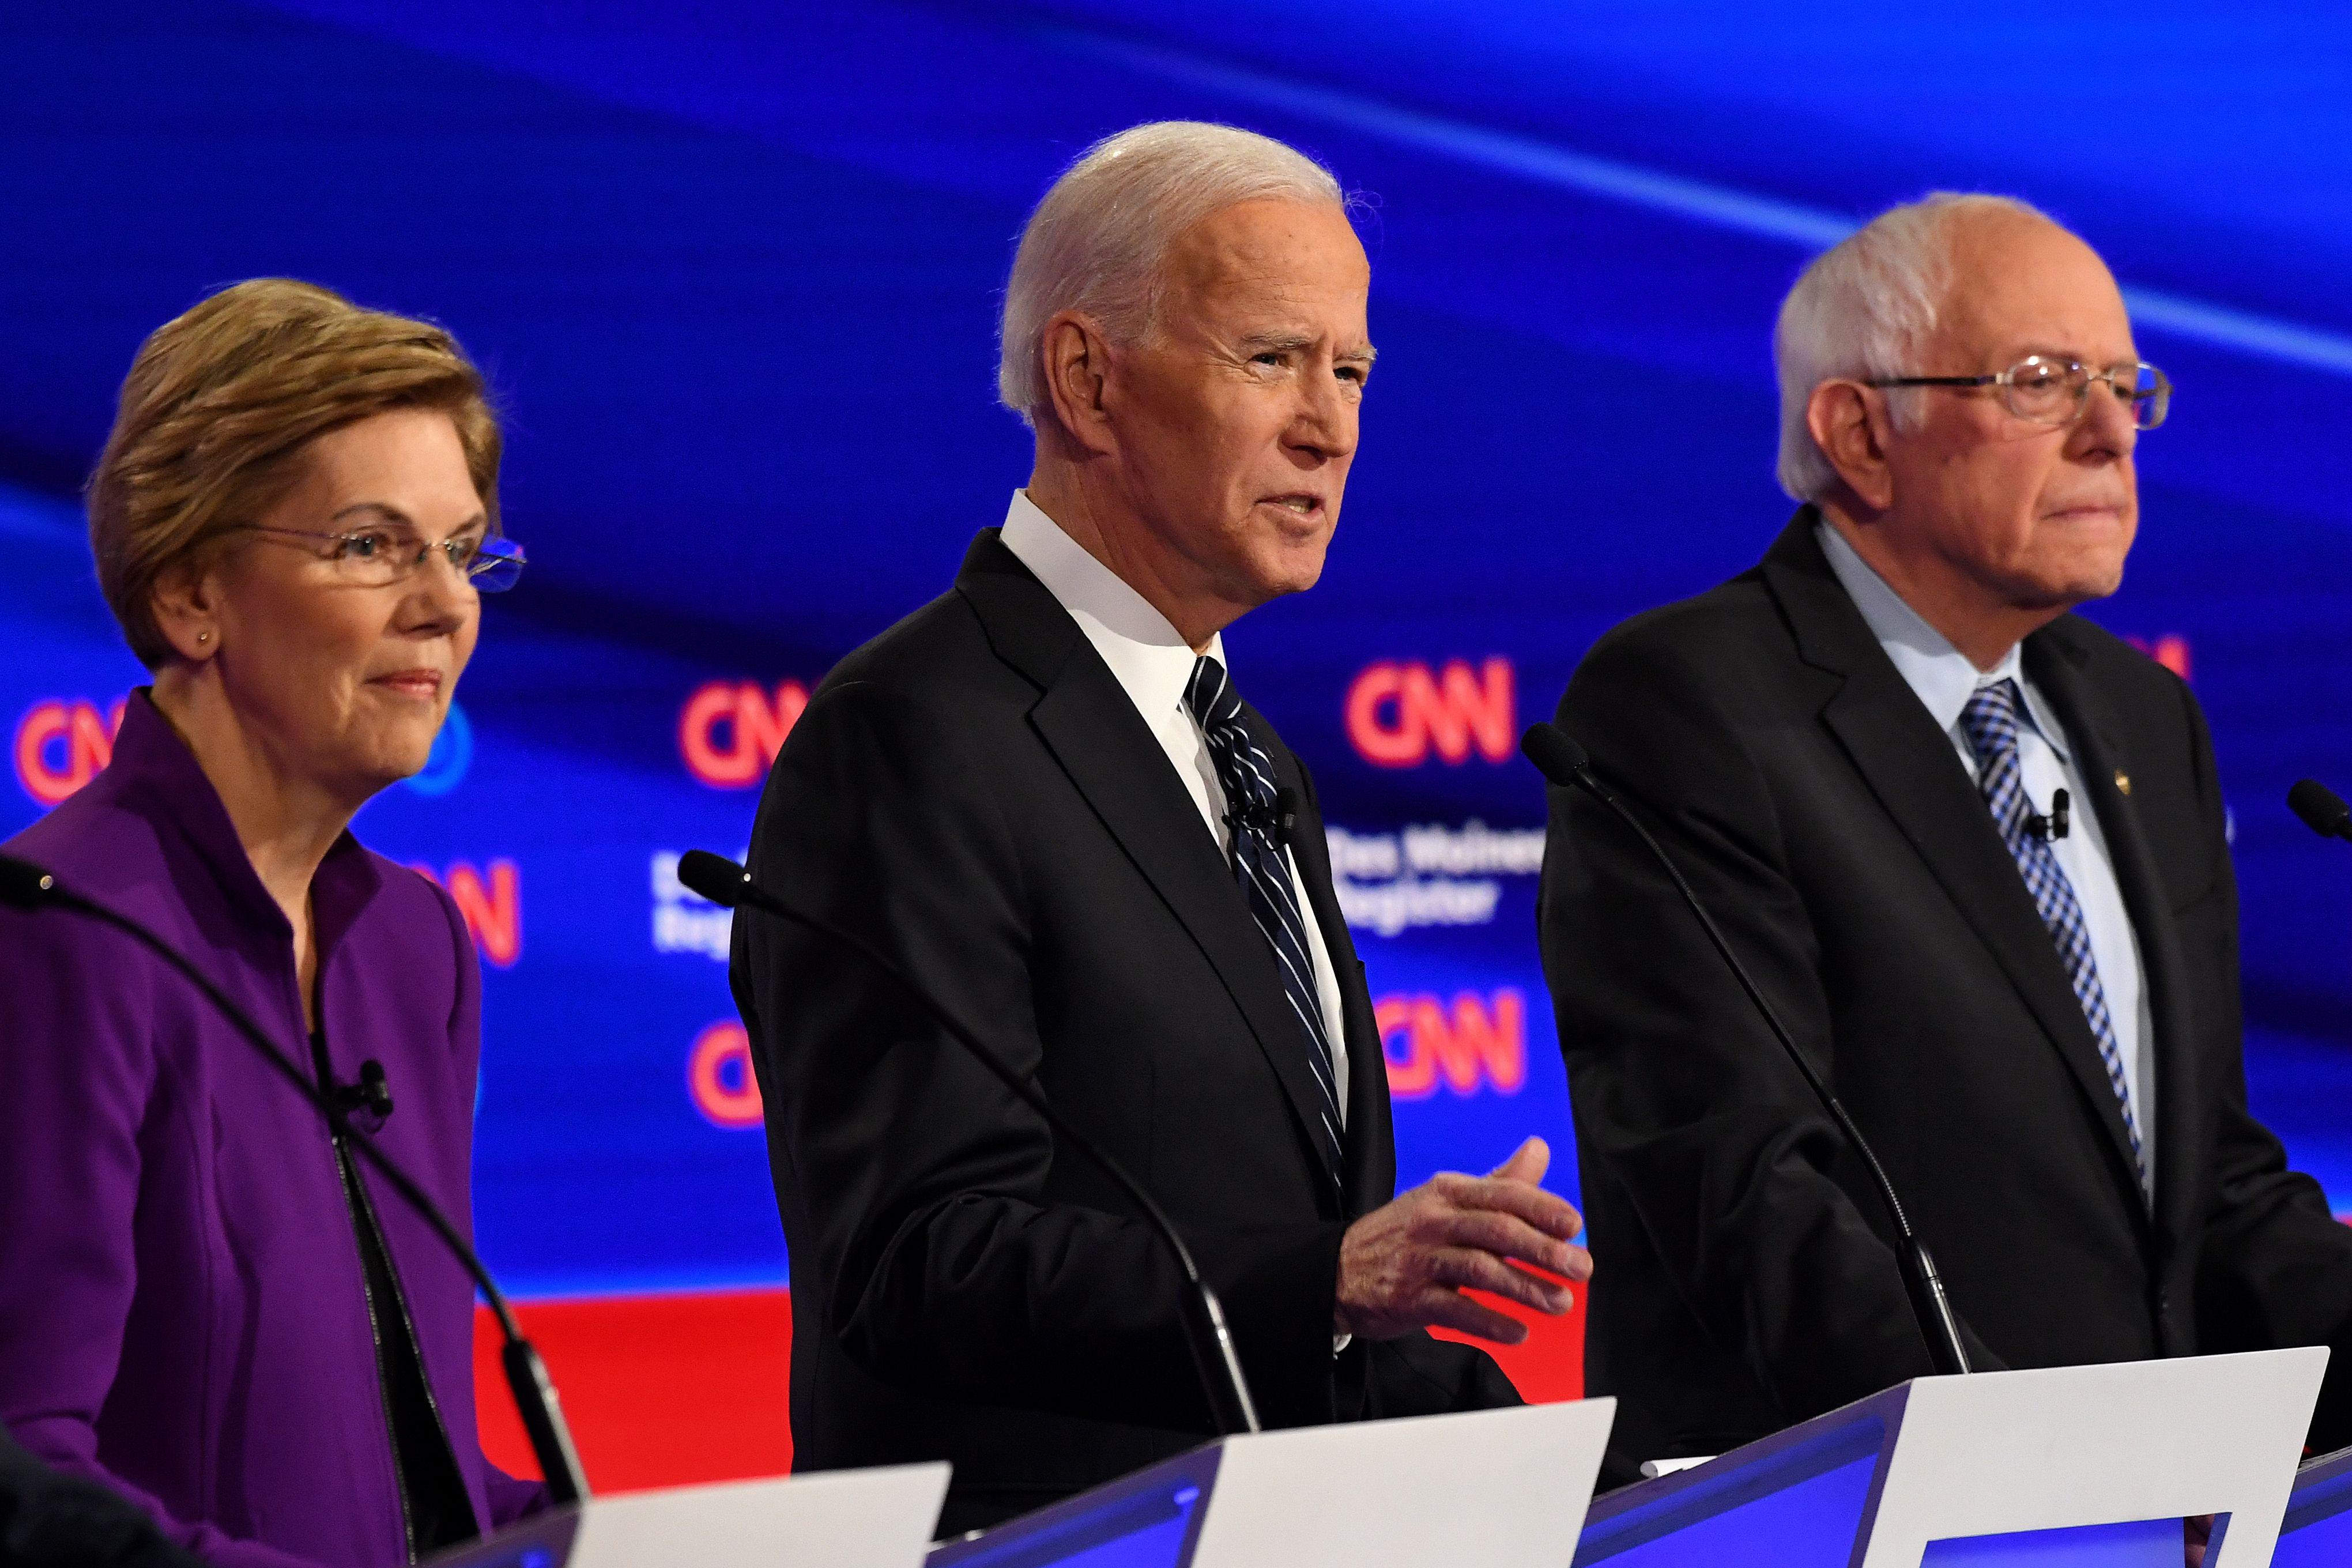 Democratic presidential hopefuls Elizabeth Warren, Joe Biden, and Bernie Sanders at the seventh Democratic primary debate on January 14, 2020. (Robyn Beck/AFP/Getty Images)